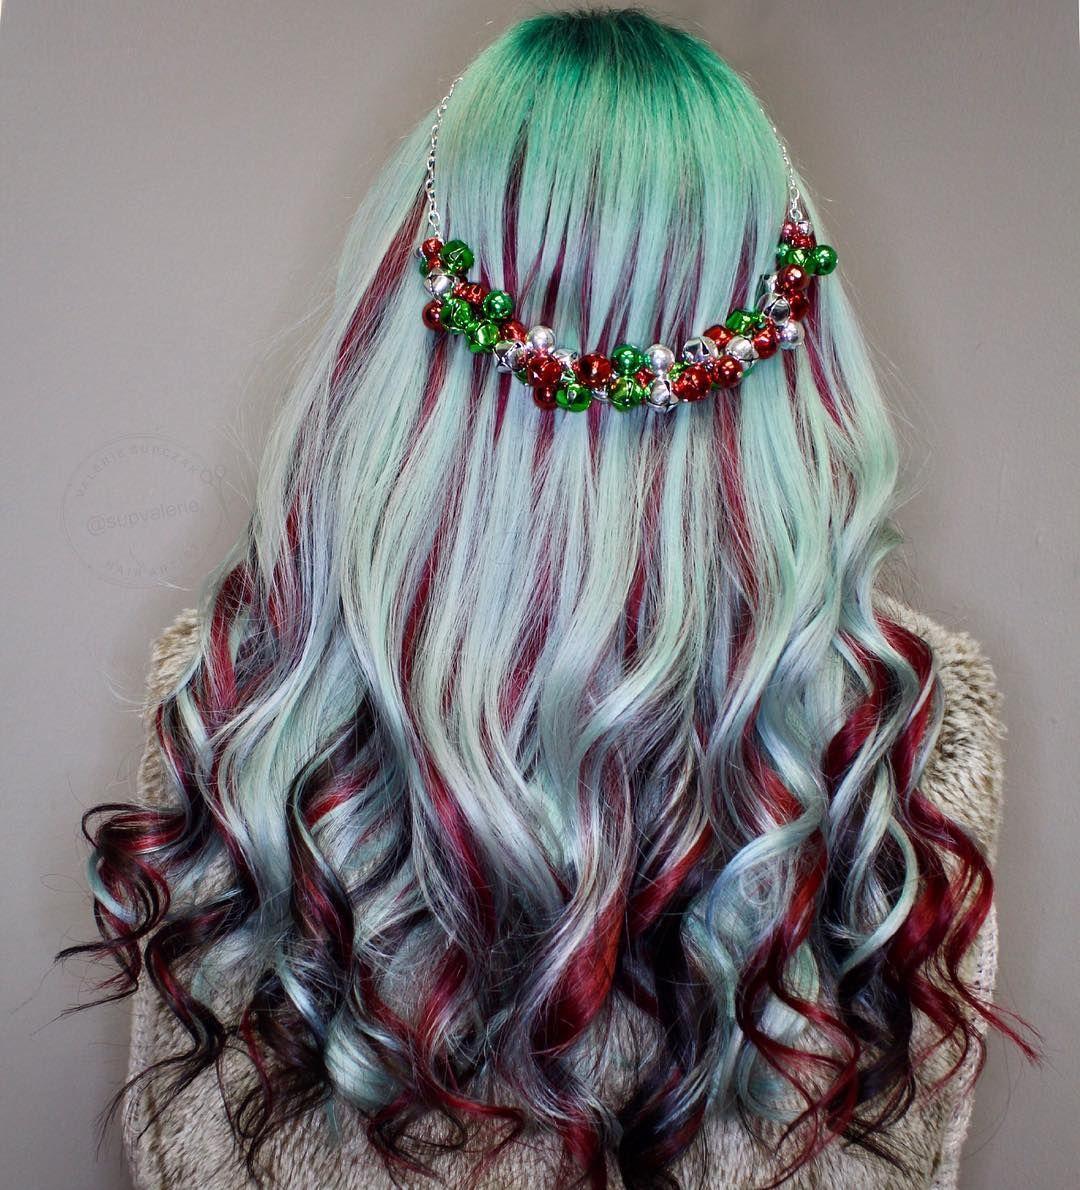 Wedding Hair Color Ideas: Jingle Bell Jingle Bells 🔔 ️🎅🏼💚 @pulpriothair #holidayslay